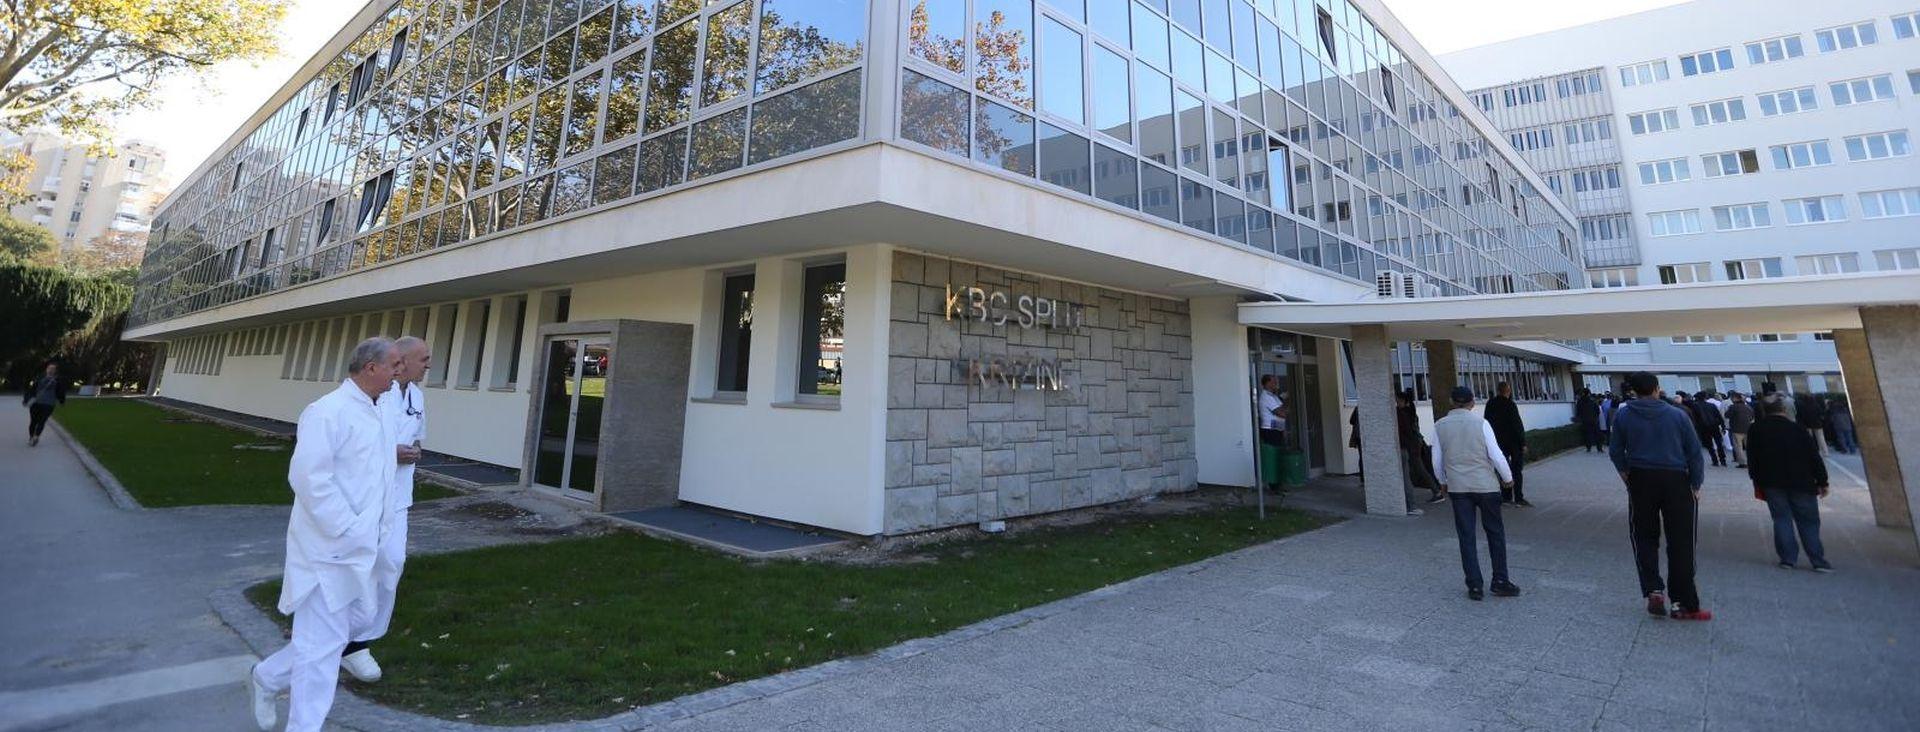 'SLUČAJ KIRETAŽA' Splitska bolnica provodi internu istragu